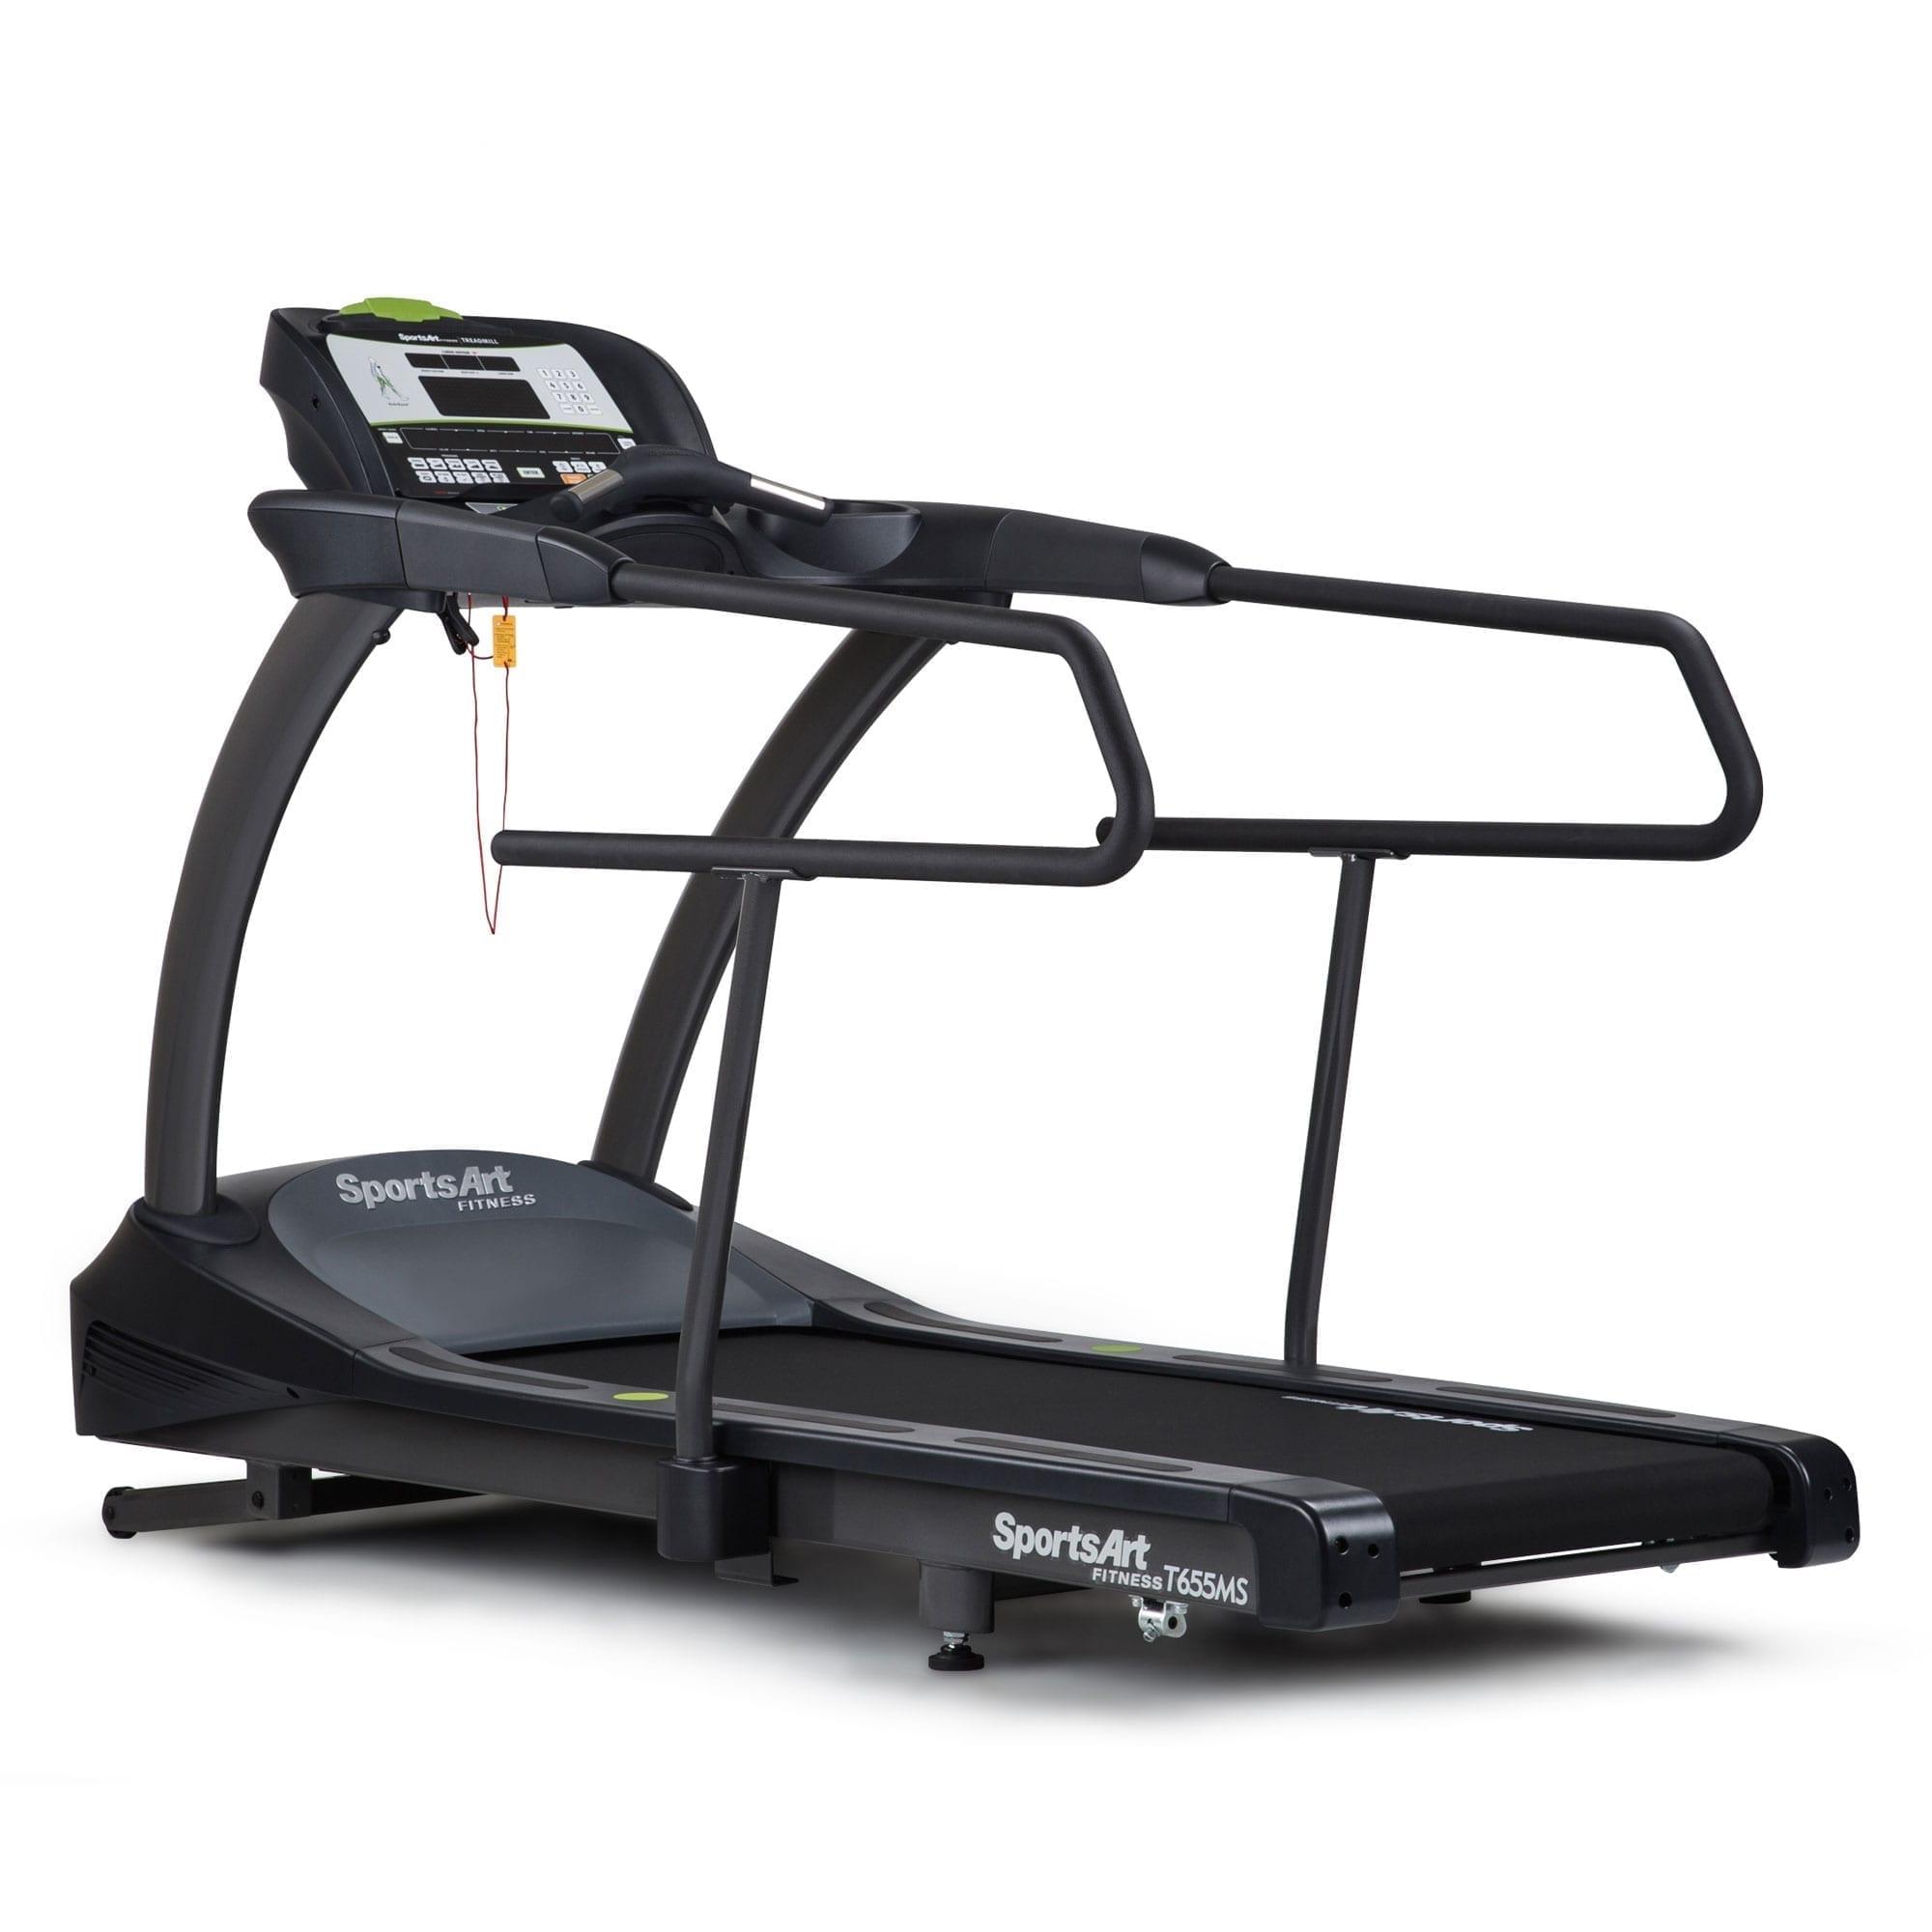 Cybex Treadmill Svc Error 3: T655MS Treadmill